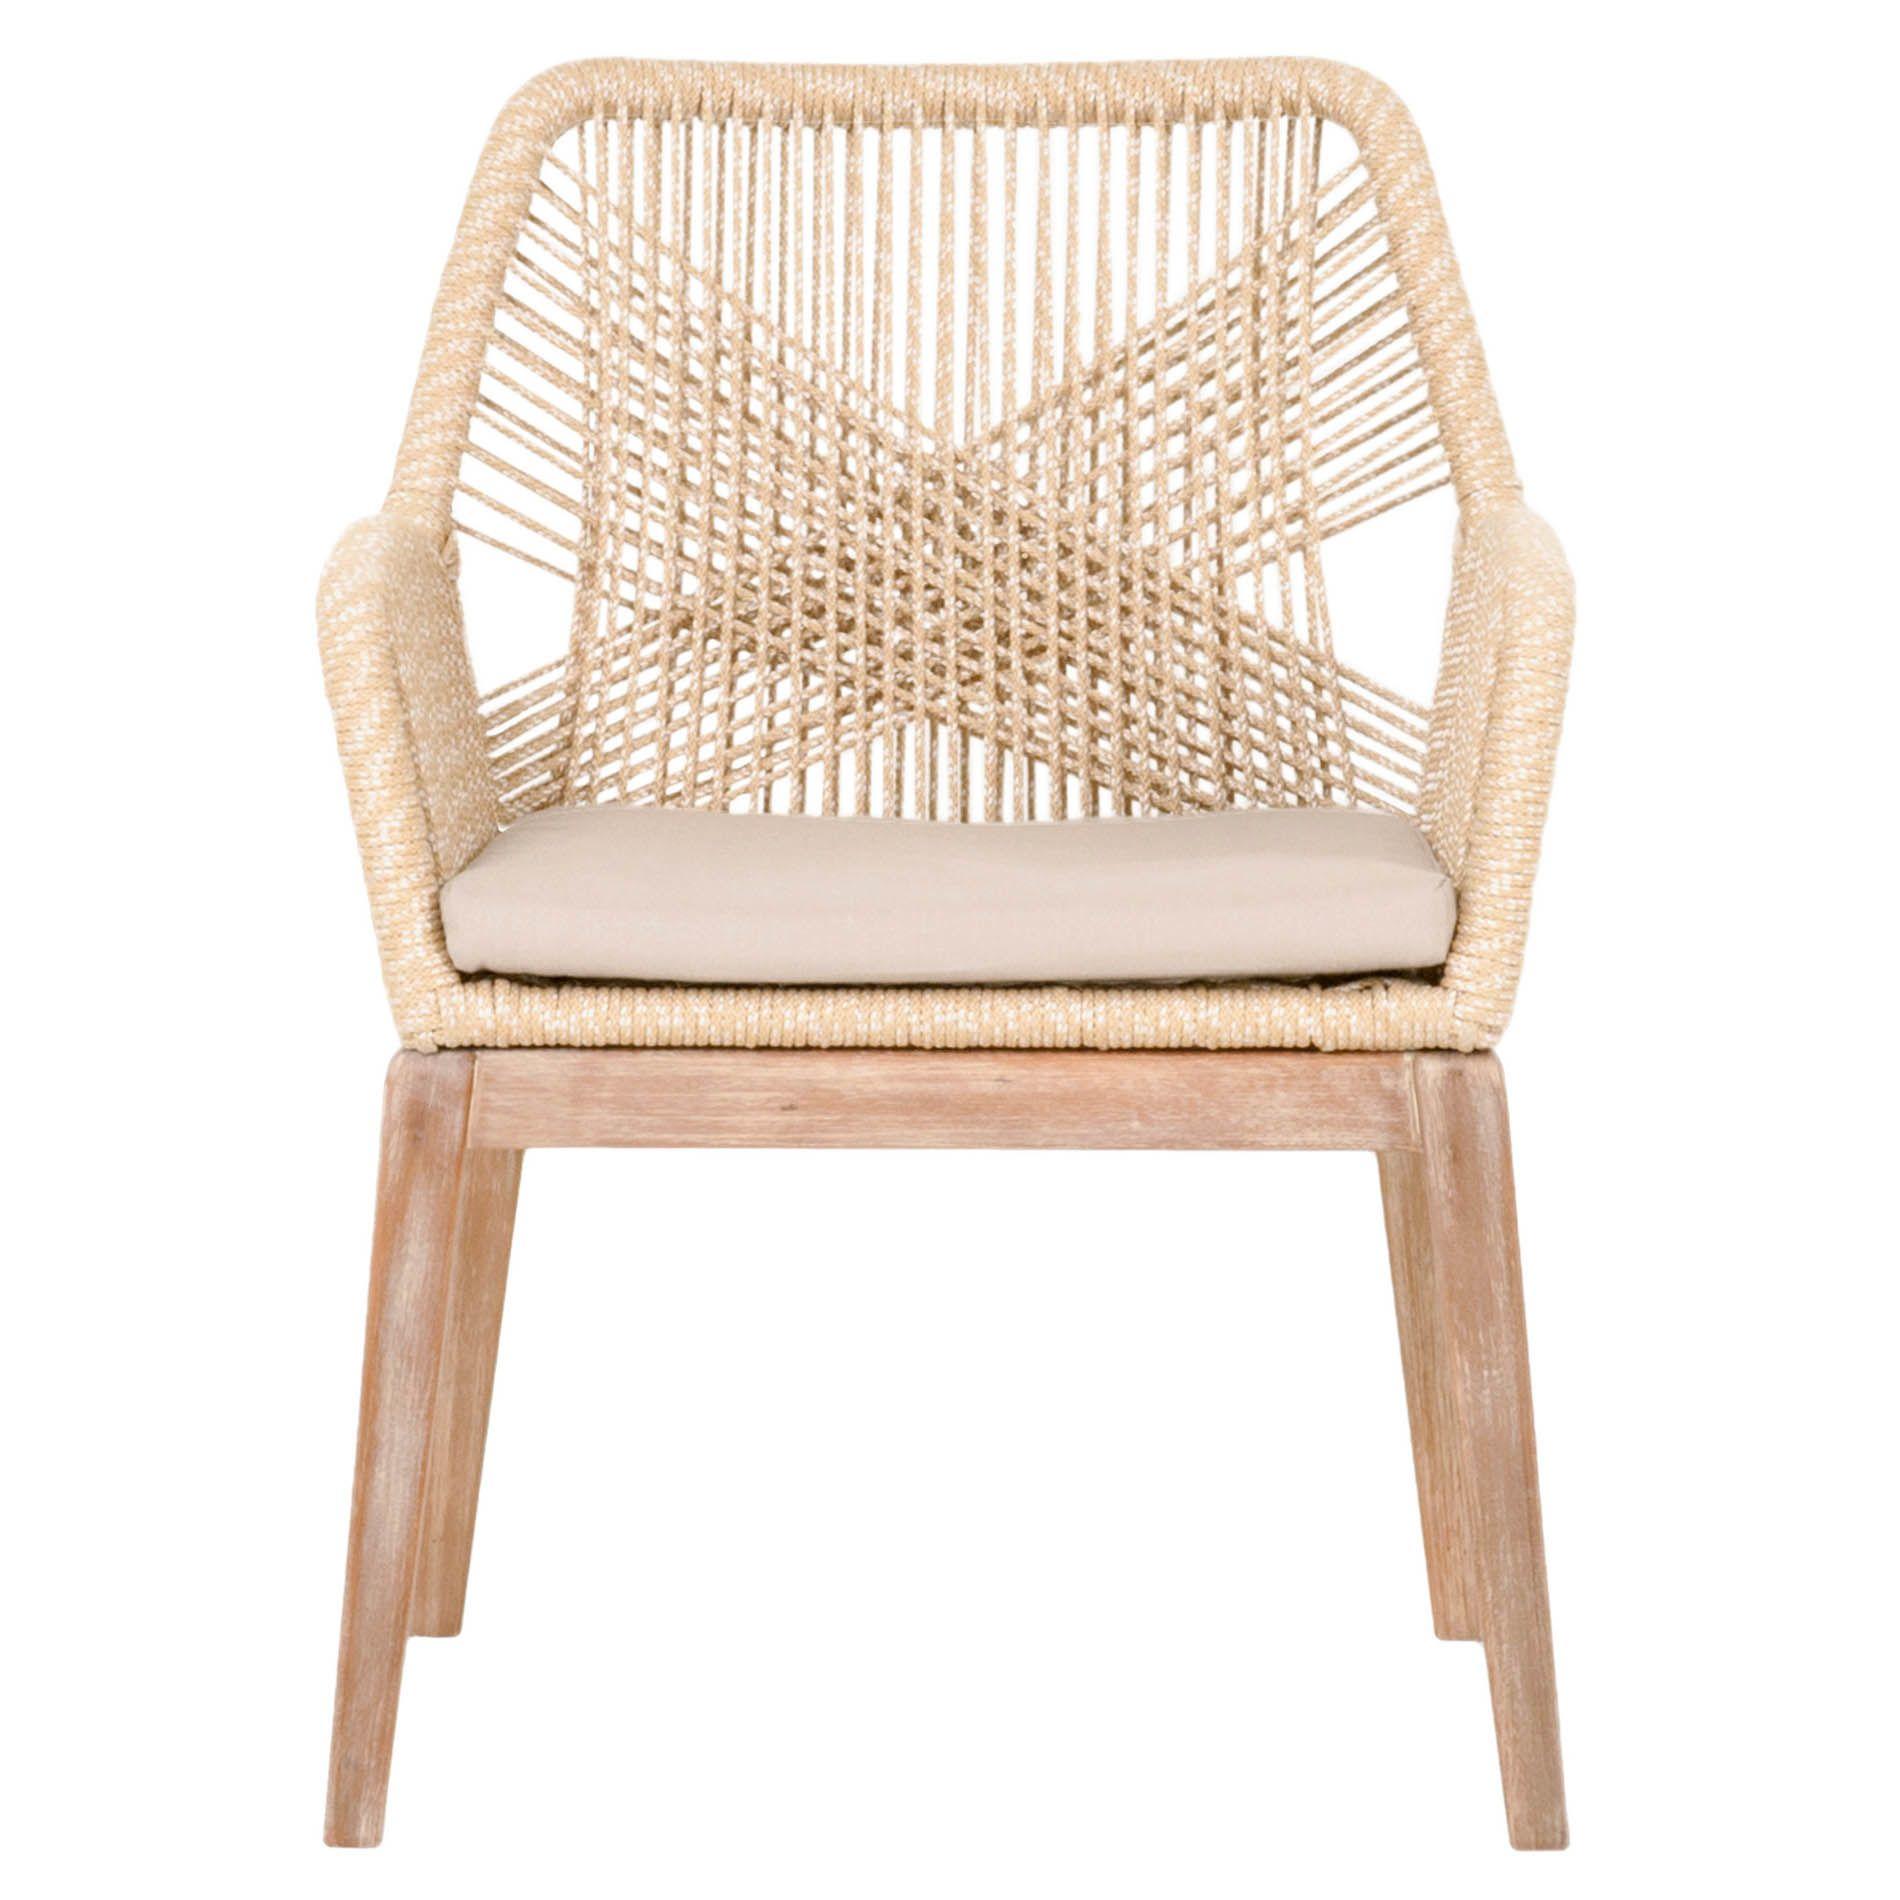 Lulu & Georgia London Arm Chair, Sand (Set Of 2) In 2019